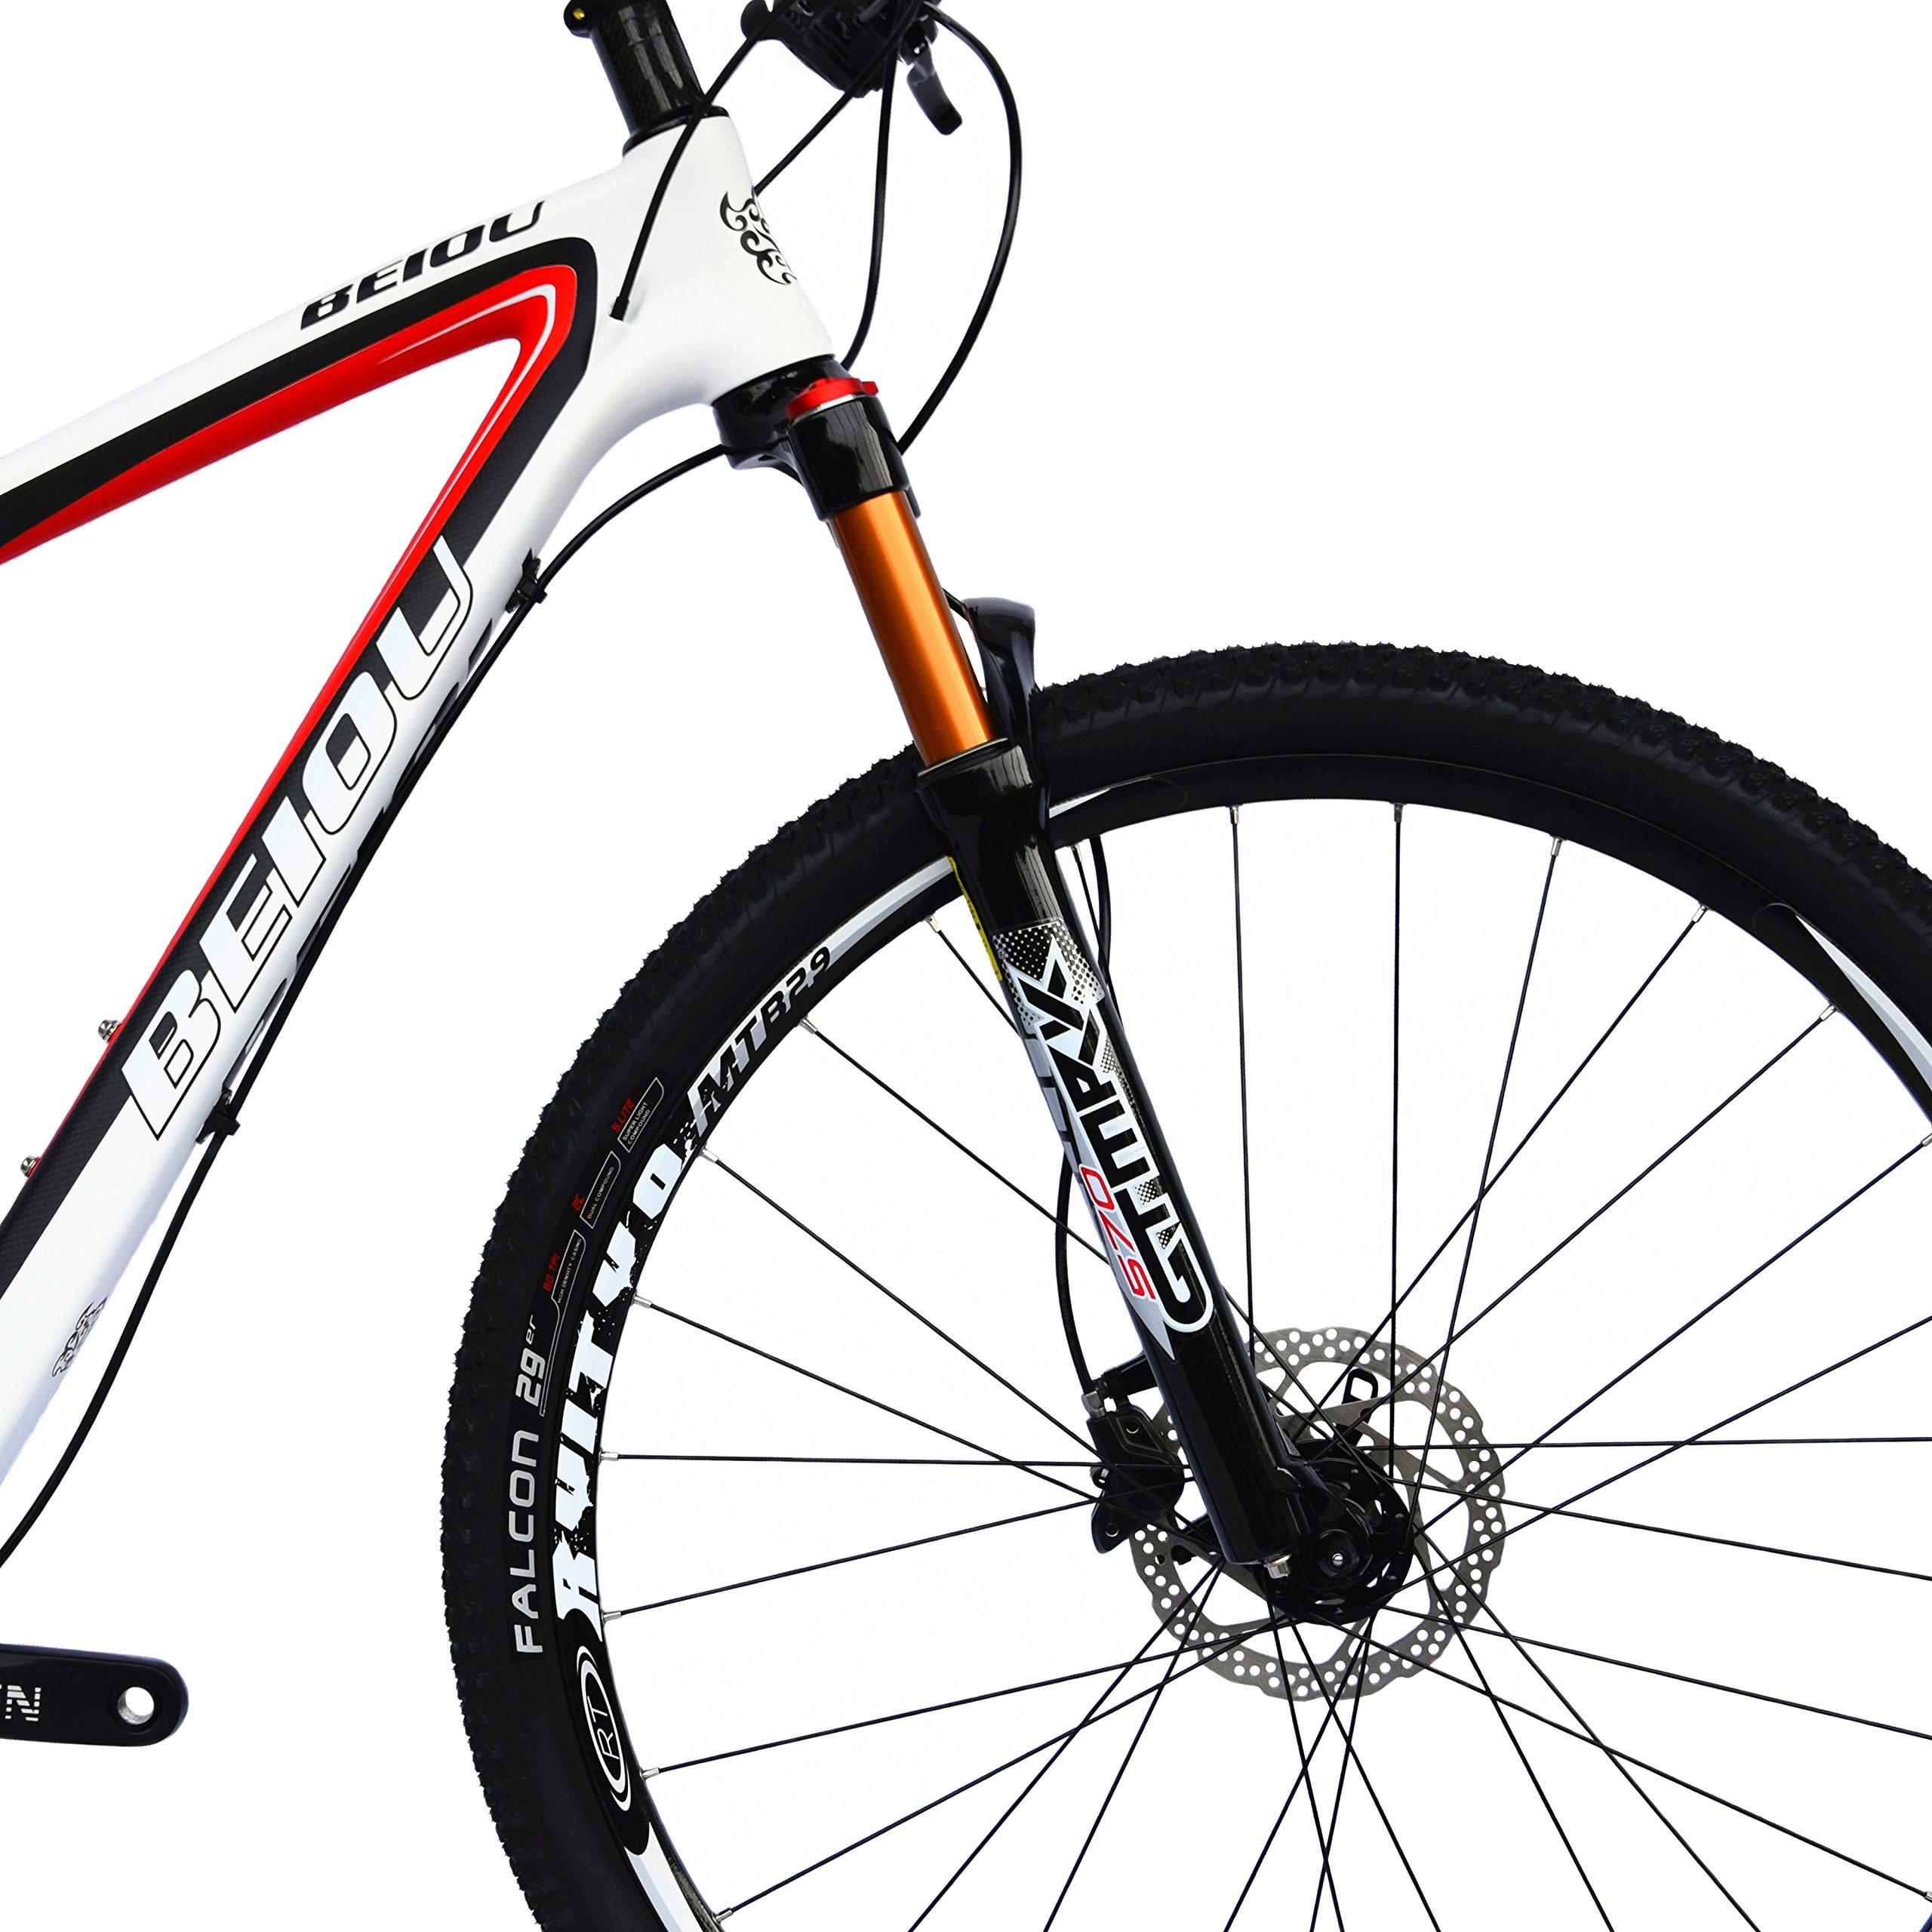 Beiou Carbon Fiber Mountain Bike Review 6